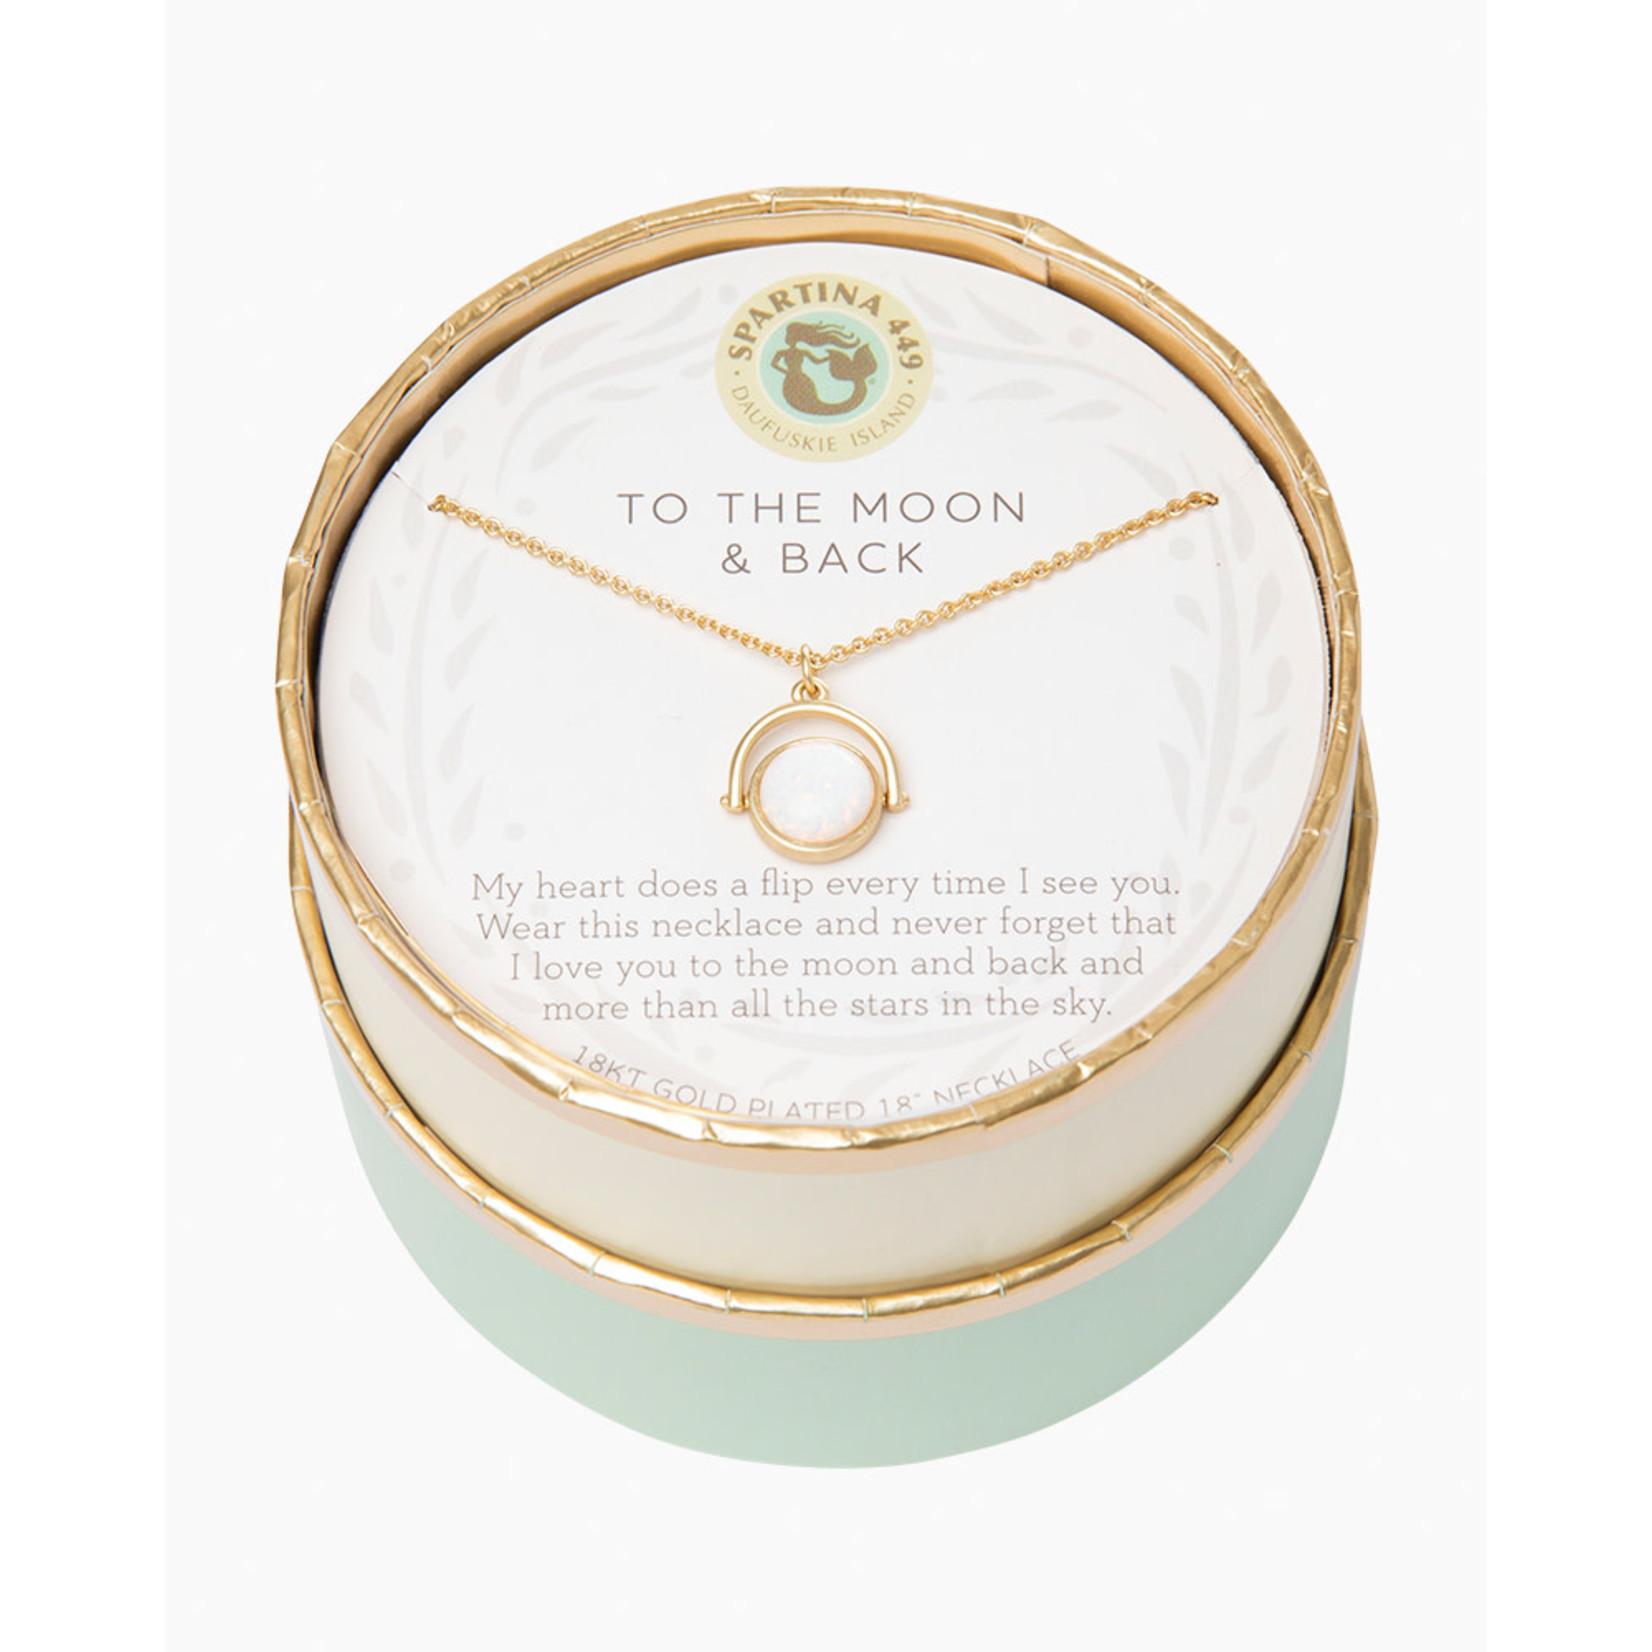 "Spartina Sea La Vie Necklace 18"" To The Moon Back/Heart Flip"